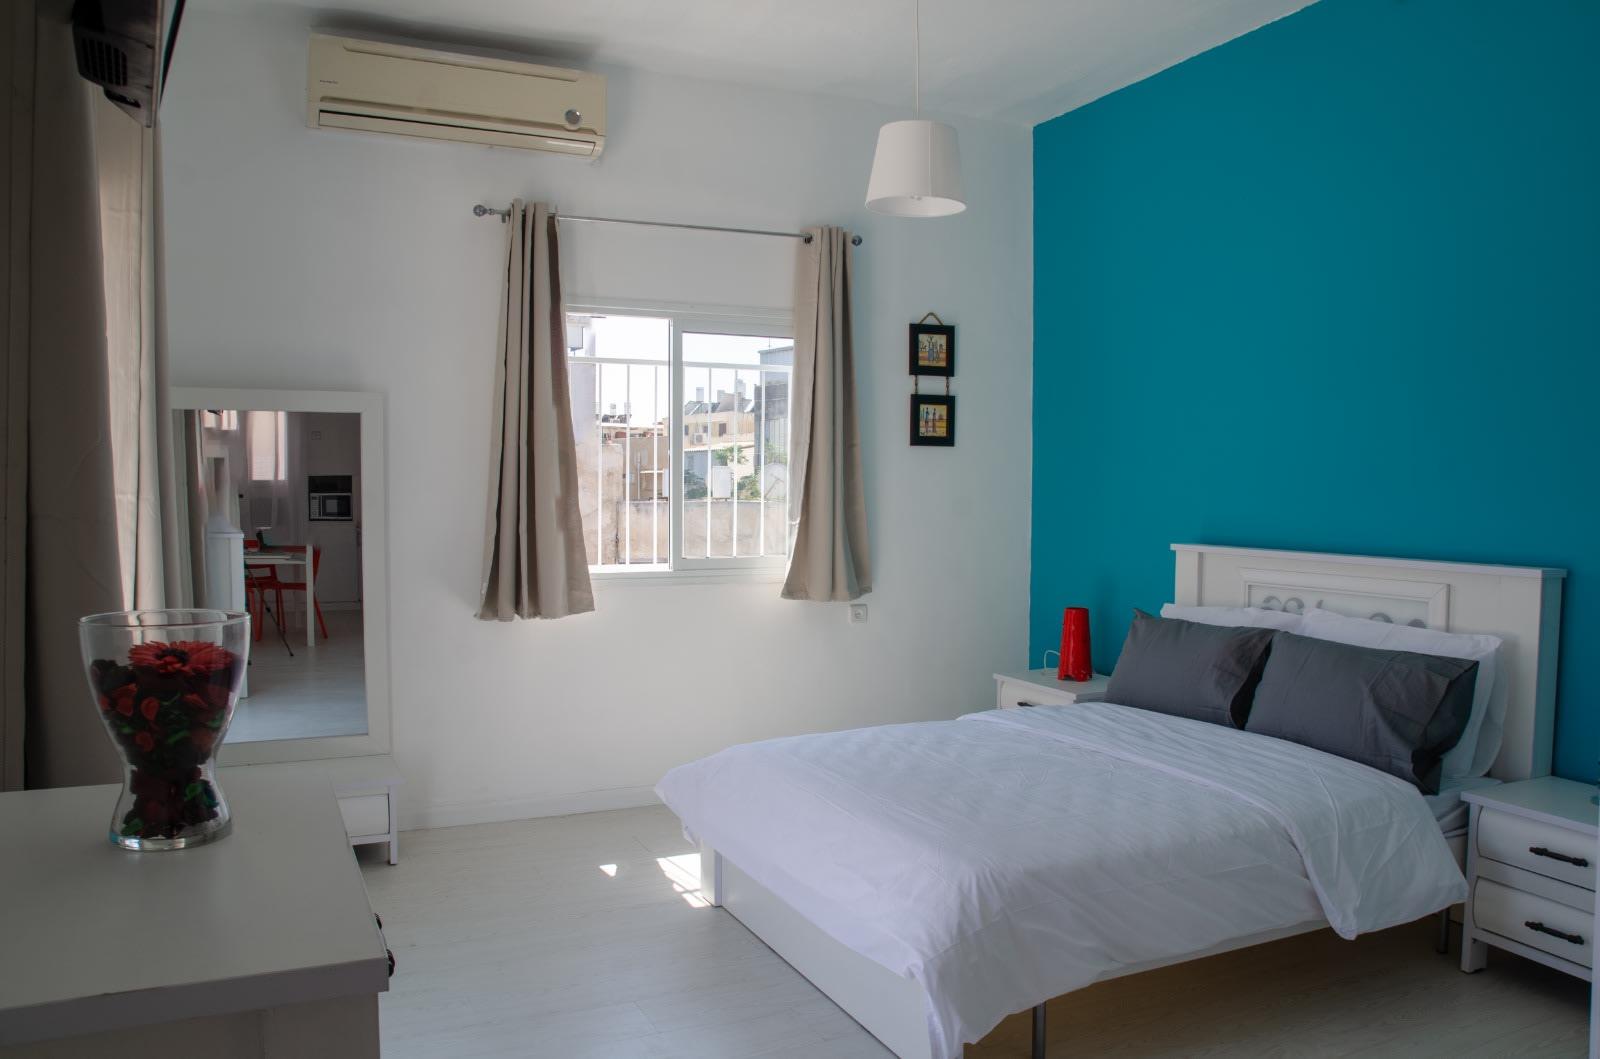 HOSTEL - Hostel BU93